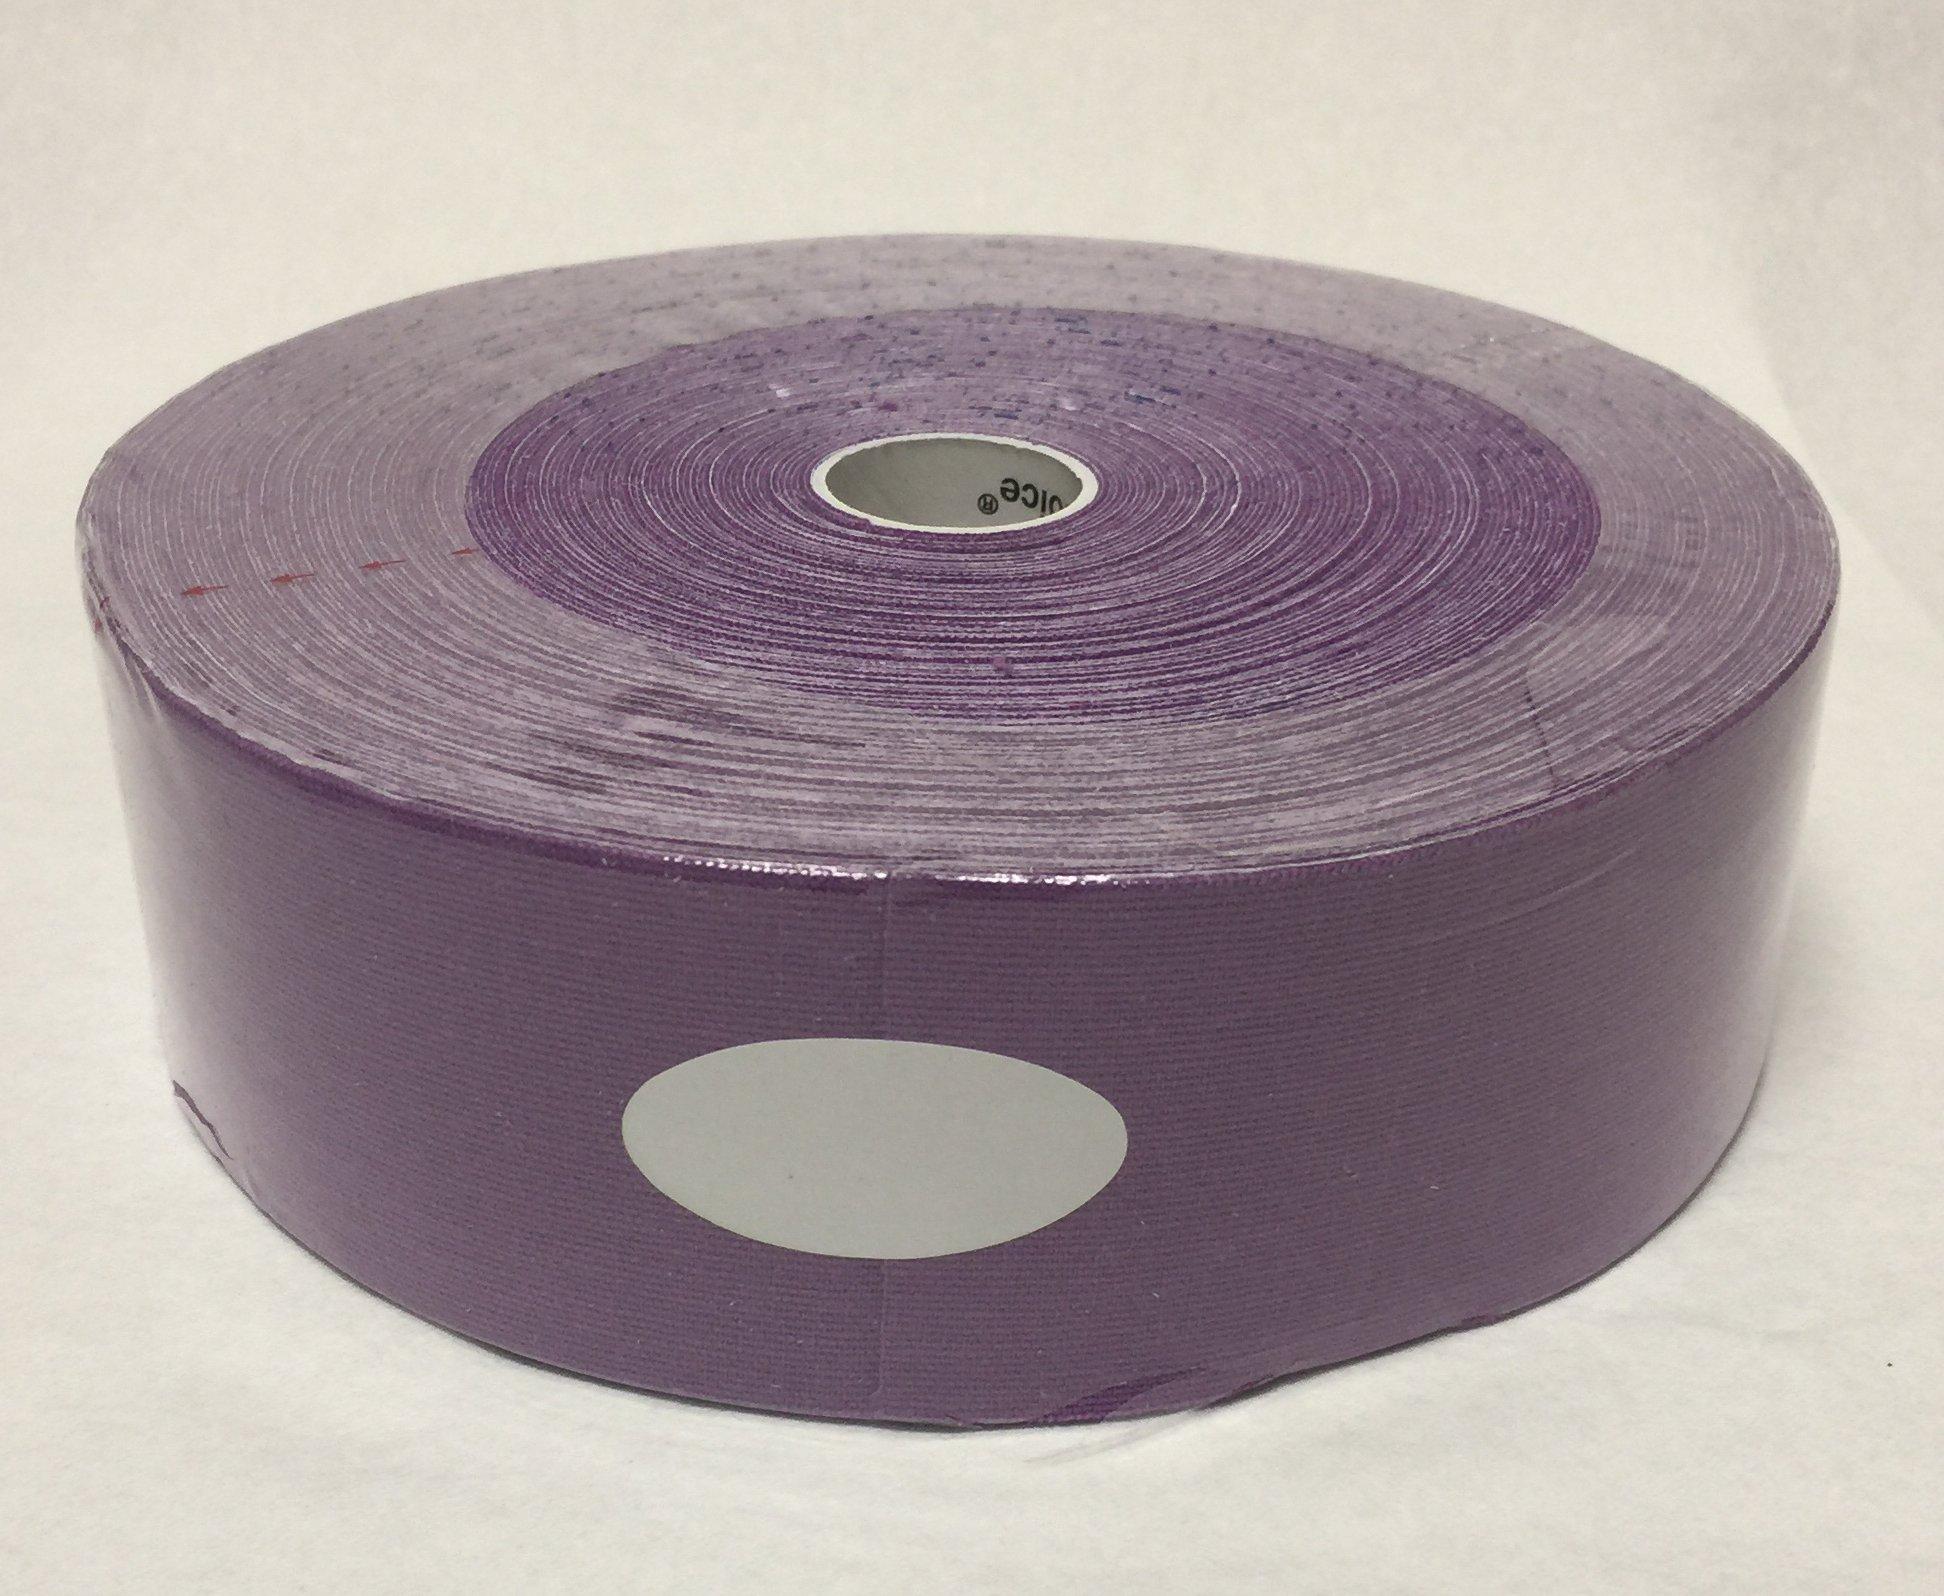 Therapist's Choice® Kinesiology Tape Bulk Roll (2-Inch x 105-Feet) (Light Purple)